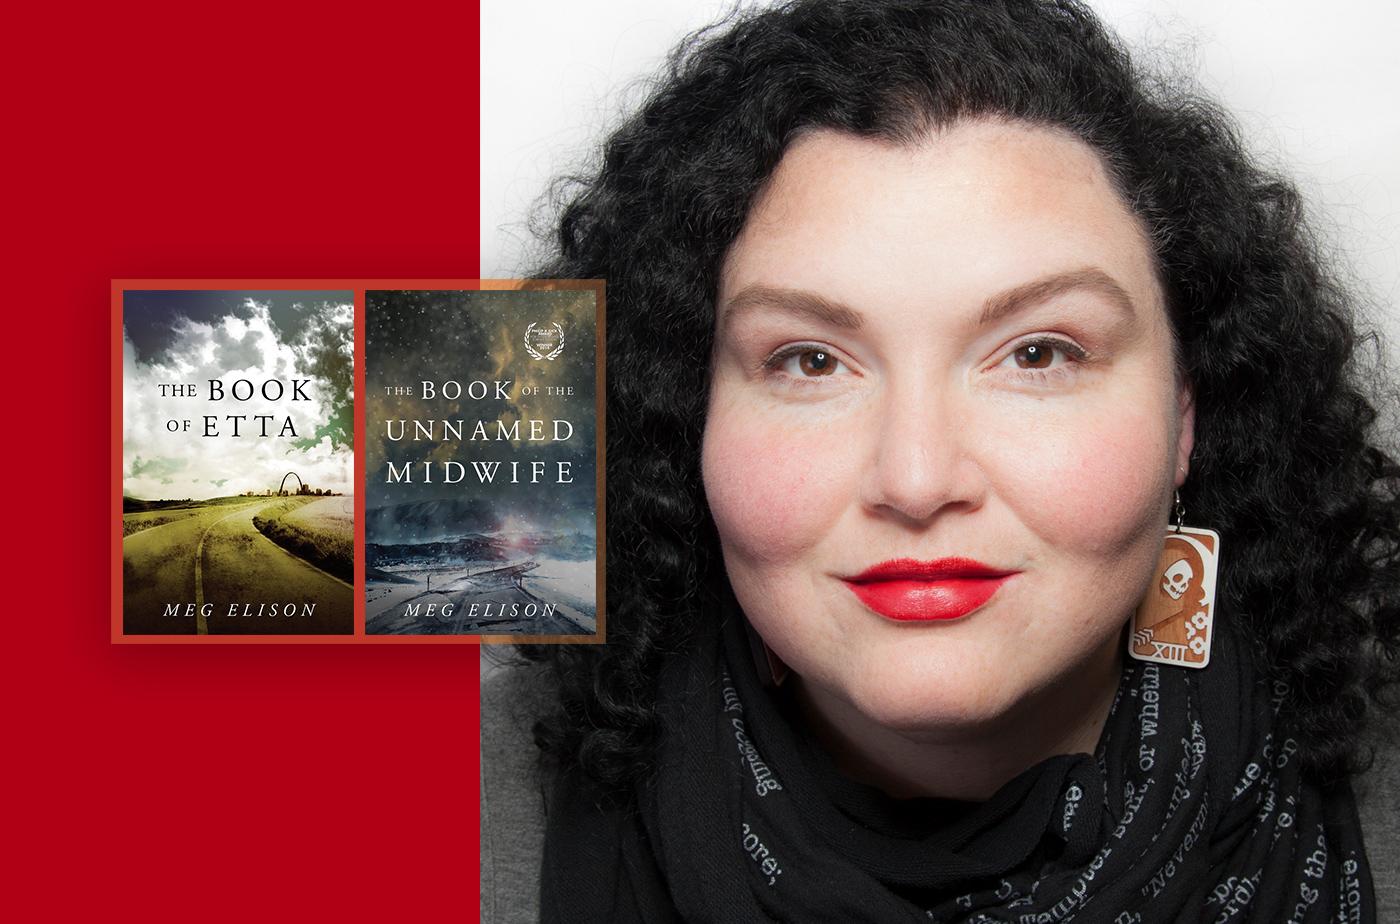 Catapult online classes: Meg Elison, 6-Week Online Genre Fiction Workshop: How to Build a World, Fiction, Workshop